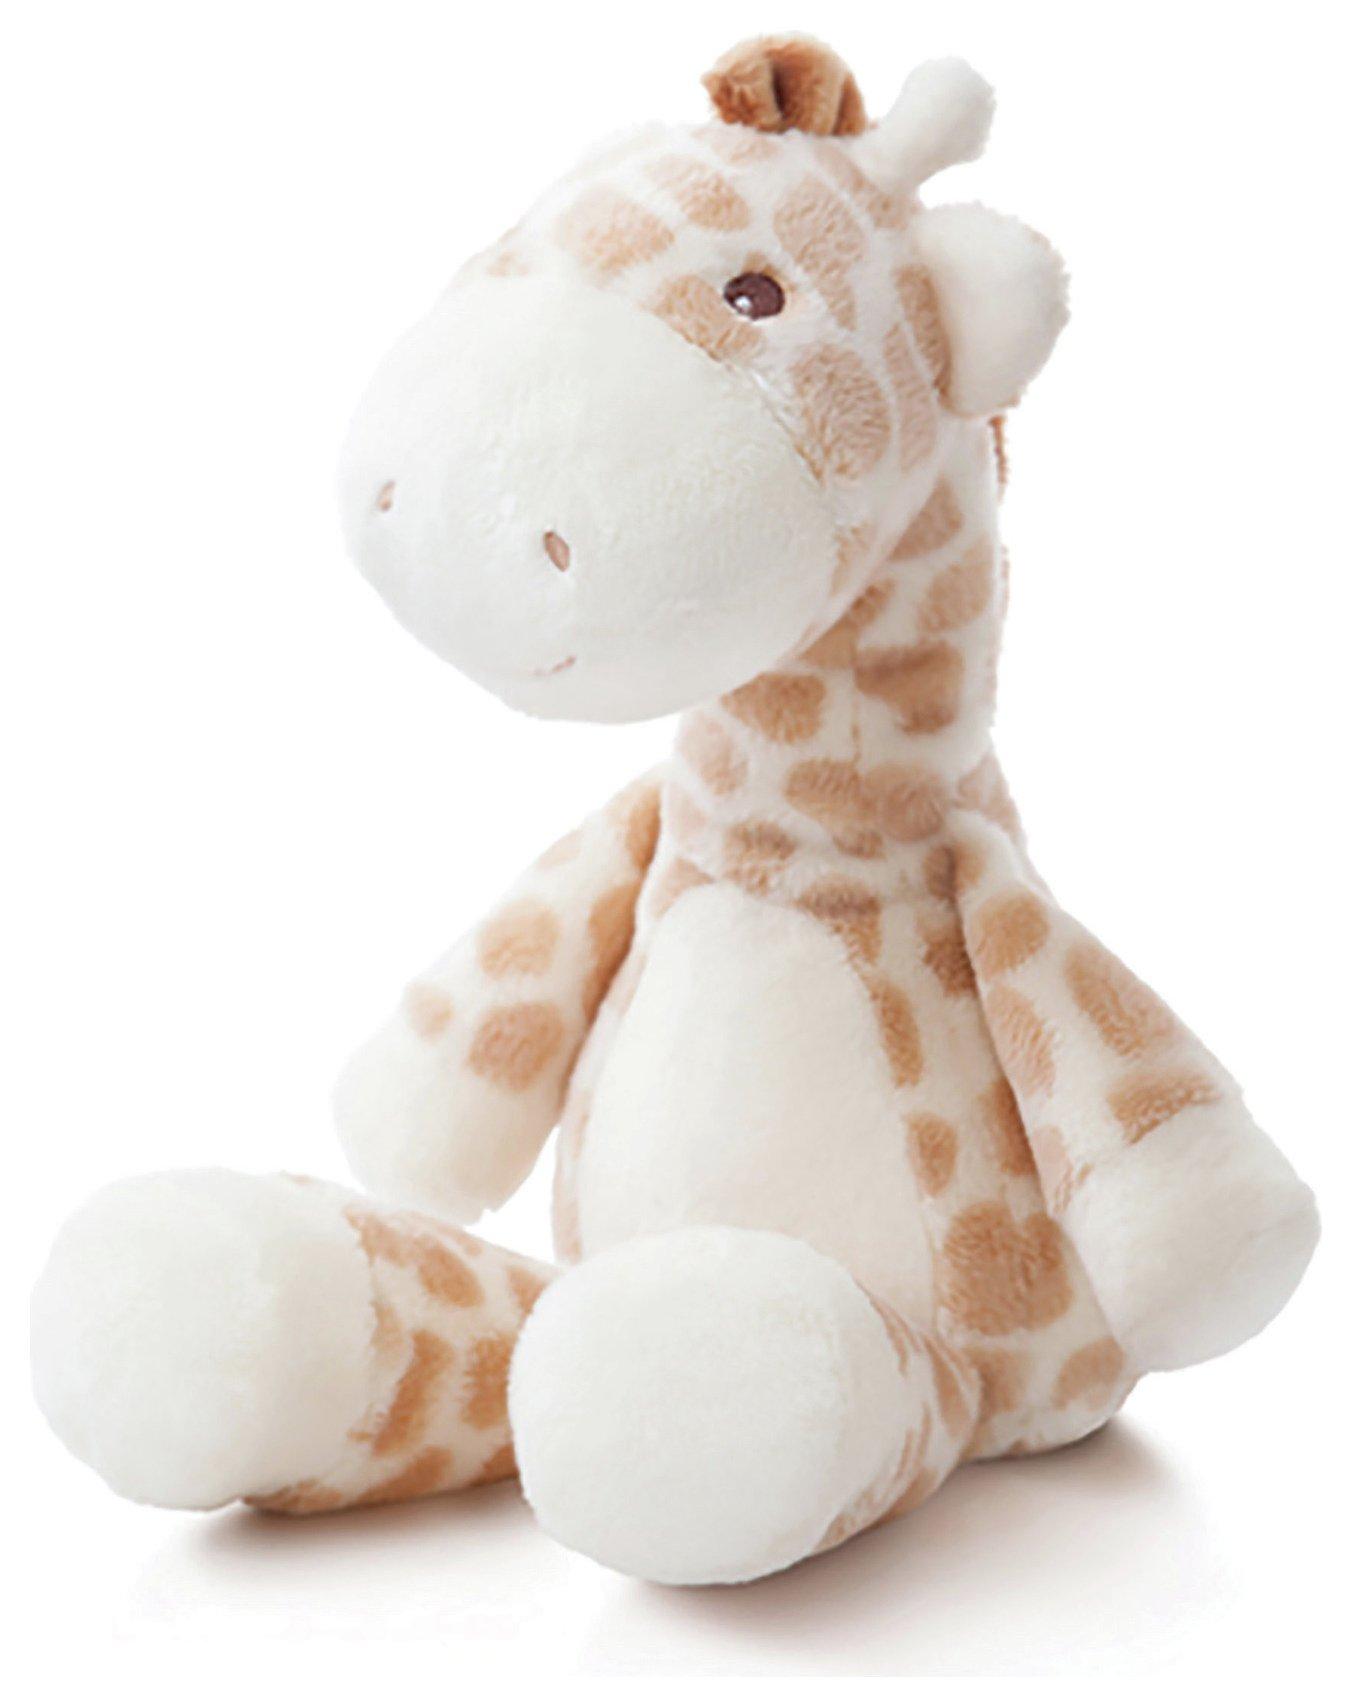 Image of Aurora 14 inch Plush Gigi Giraffe.